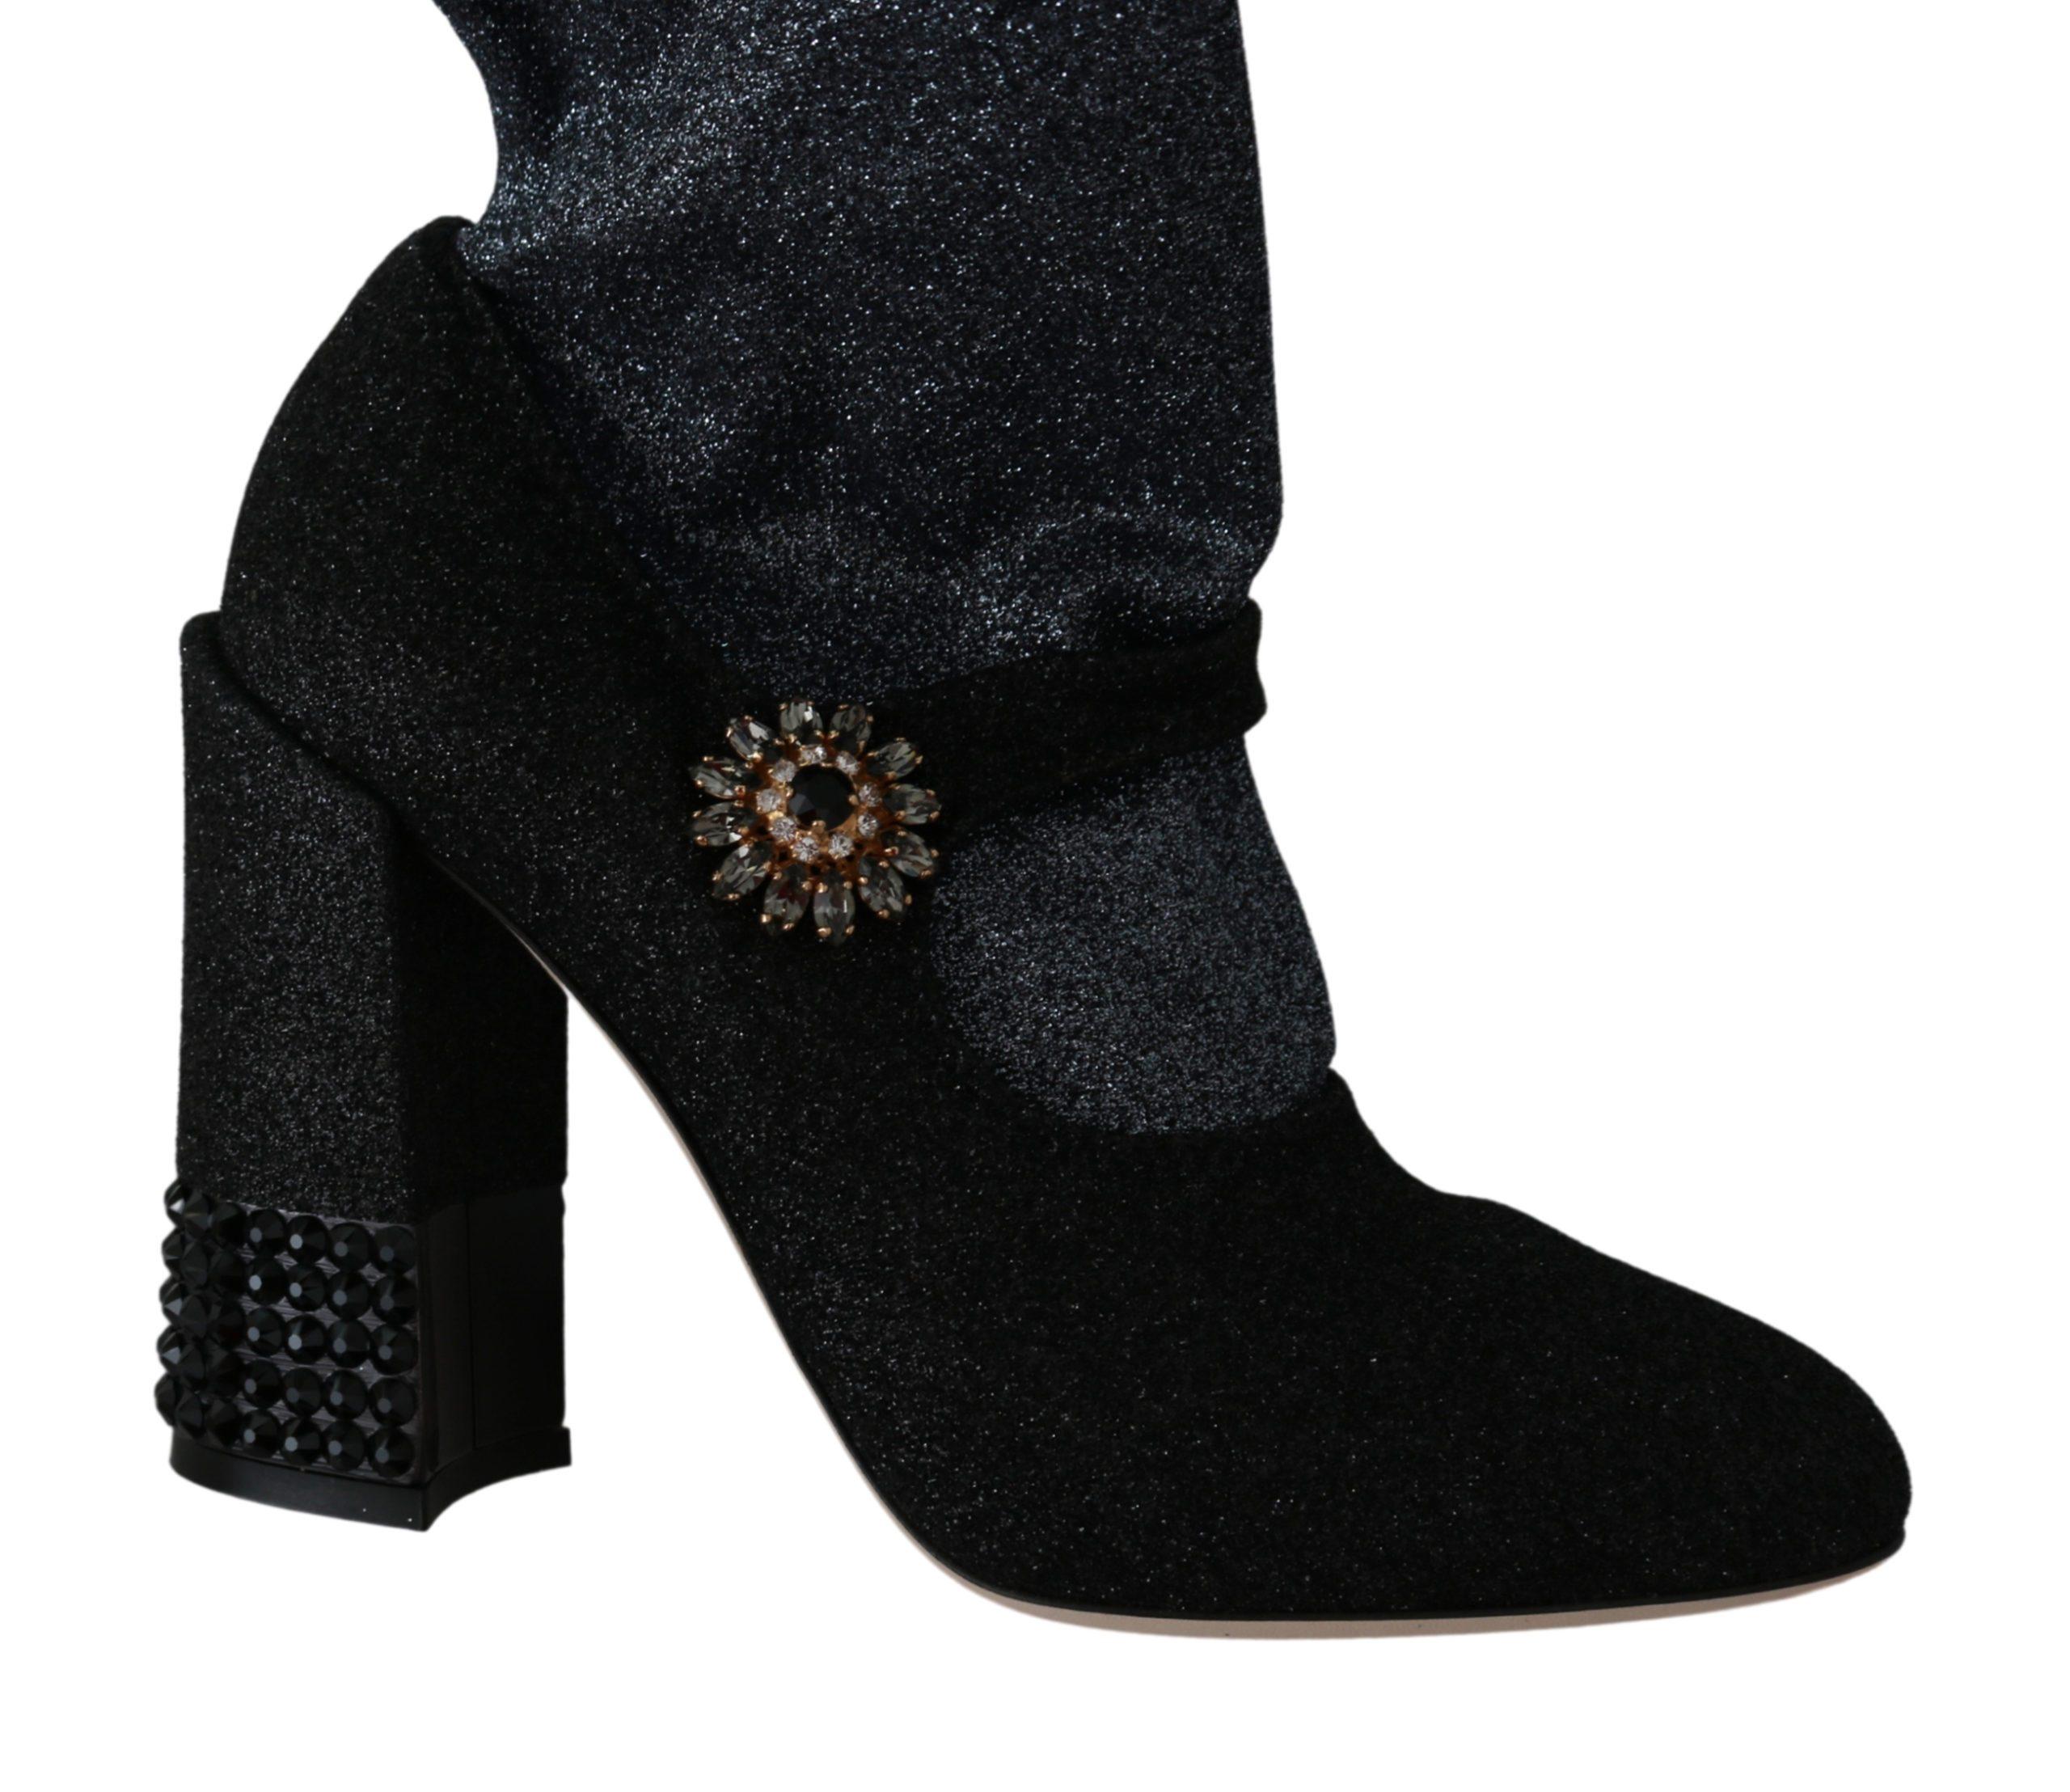 Dolce & Gabbana Women's Crystal Mary Janes Booties Black LA6441-37 - EU37/US6.5